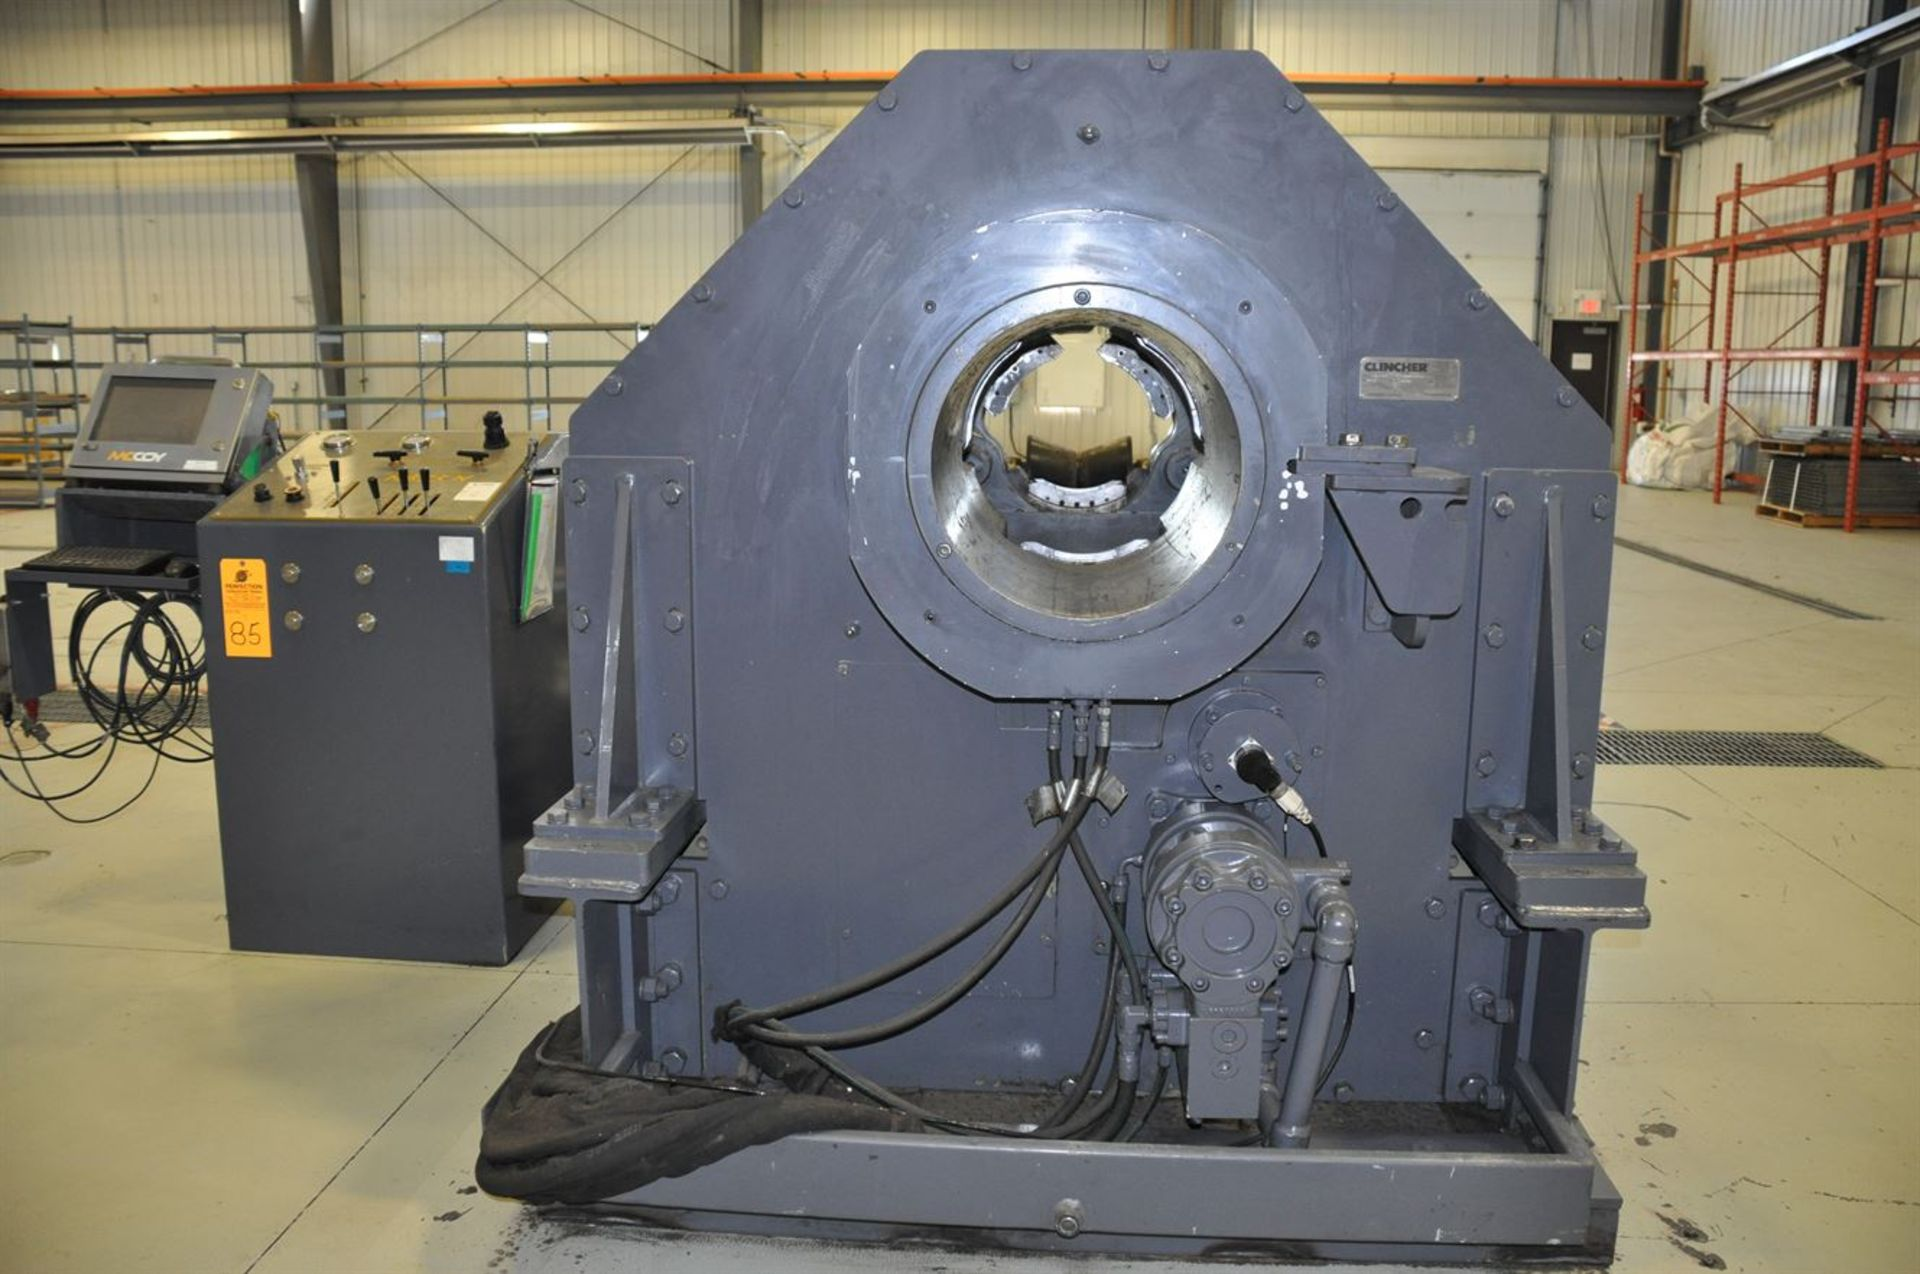 "2012 McCOY CLEBU 1500 15"" Type III Bucking Unit, s/n 8988, w/ PLC Control, Size Range: 15"" – 2. - Image 3 of 6"